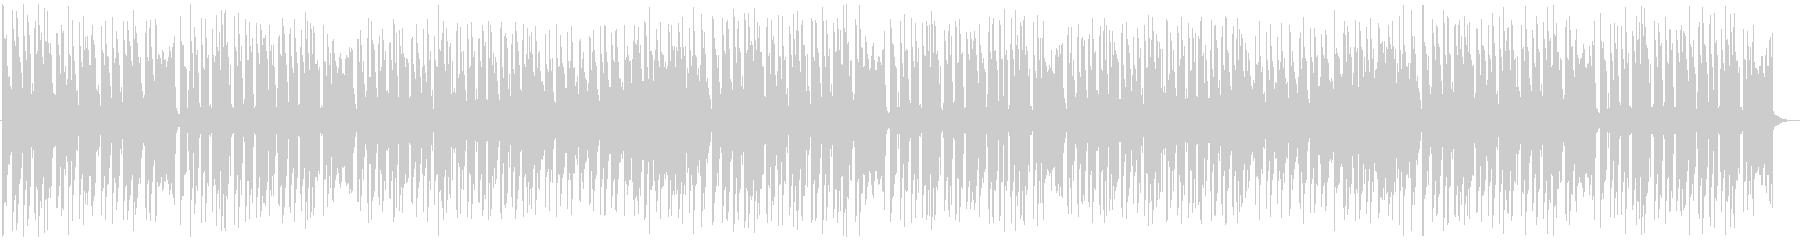 Kawaii FutureBass 01's unreproduced waveform